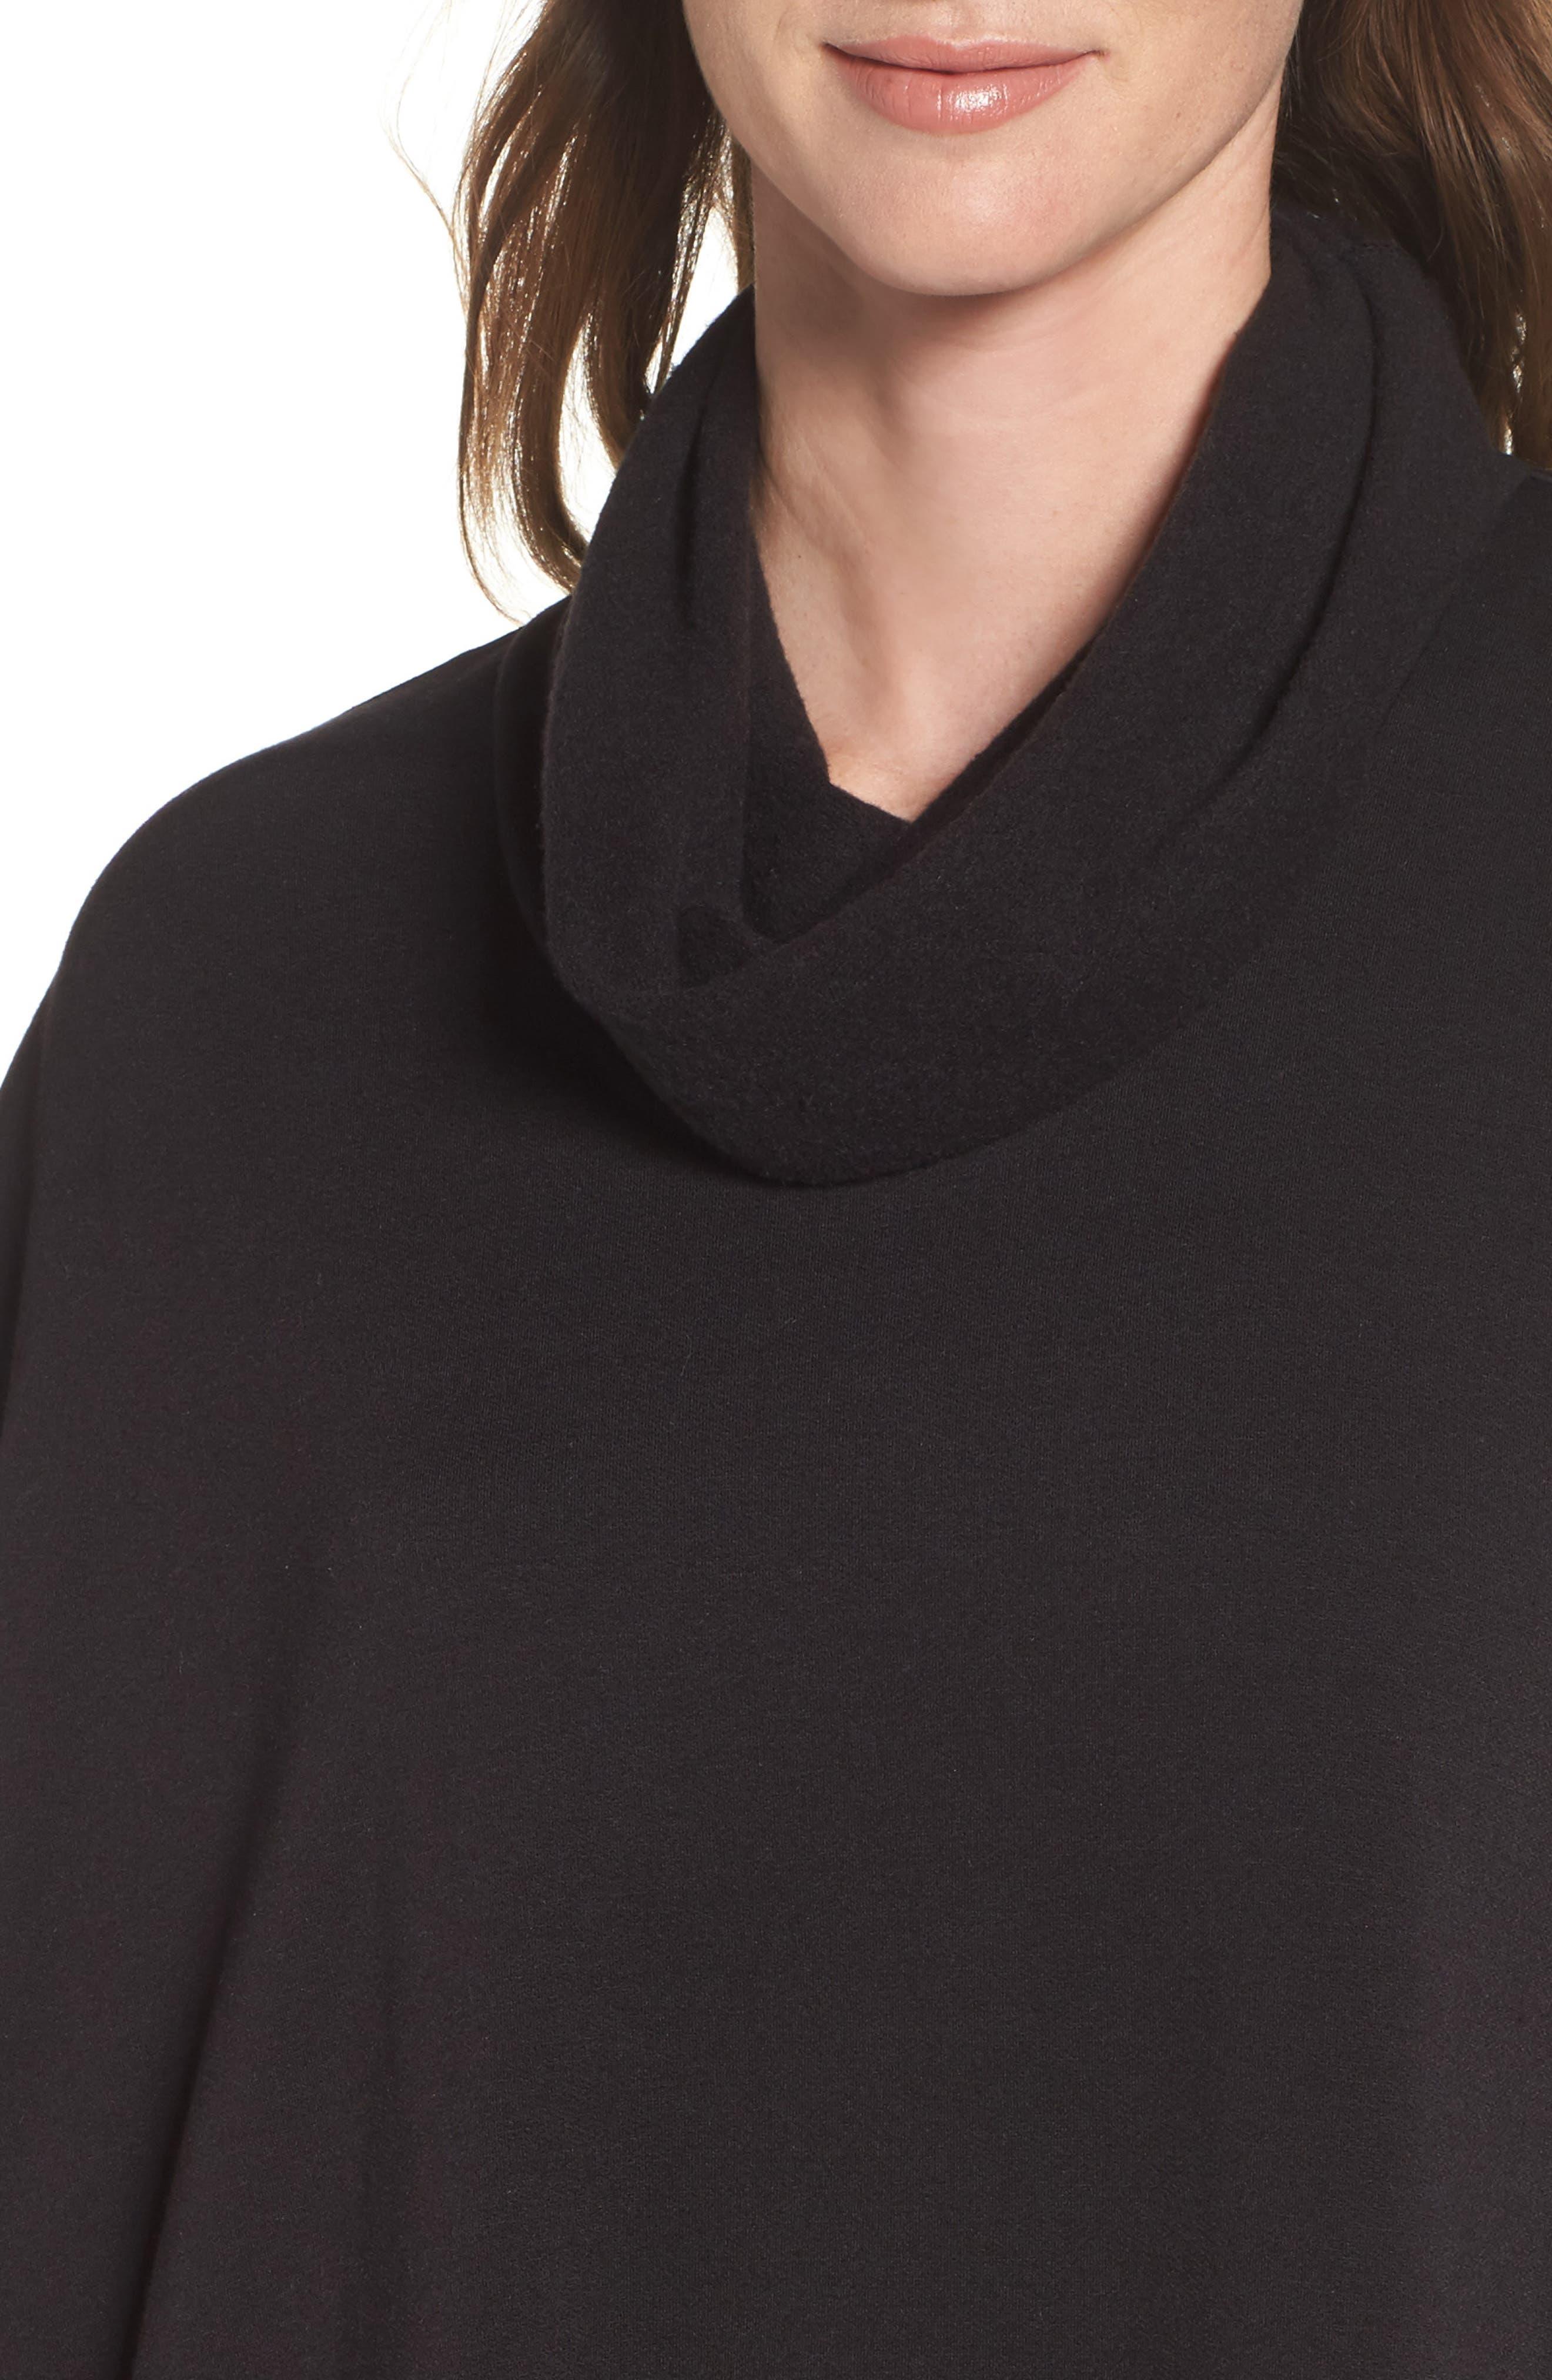 Brushed Jersey Poncho,                             Alternate thumbnail 5, color,                             Black